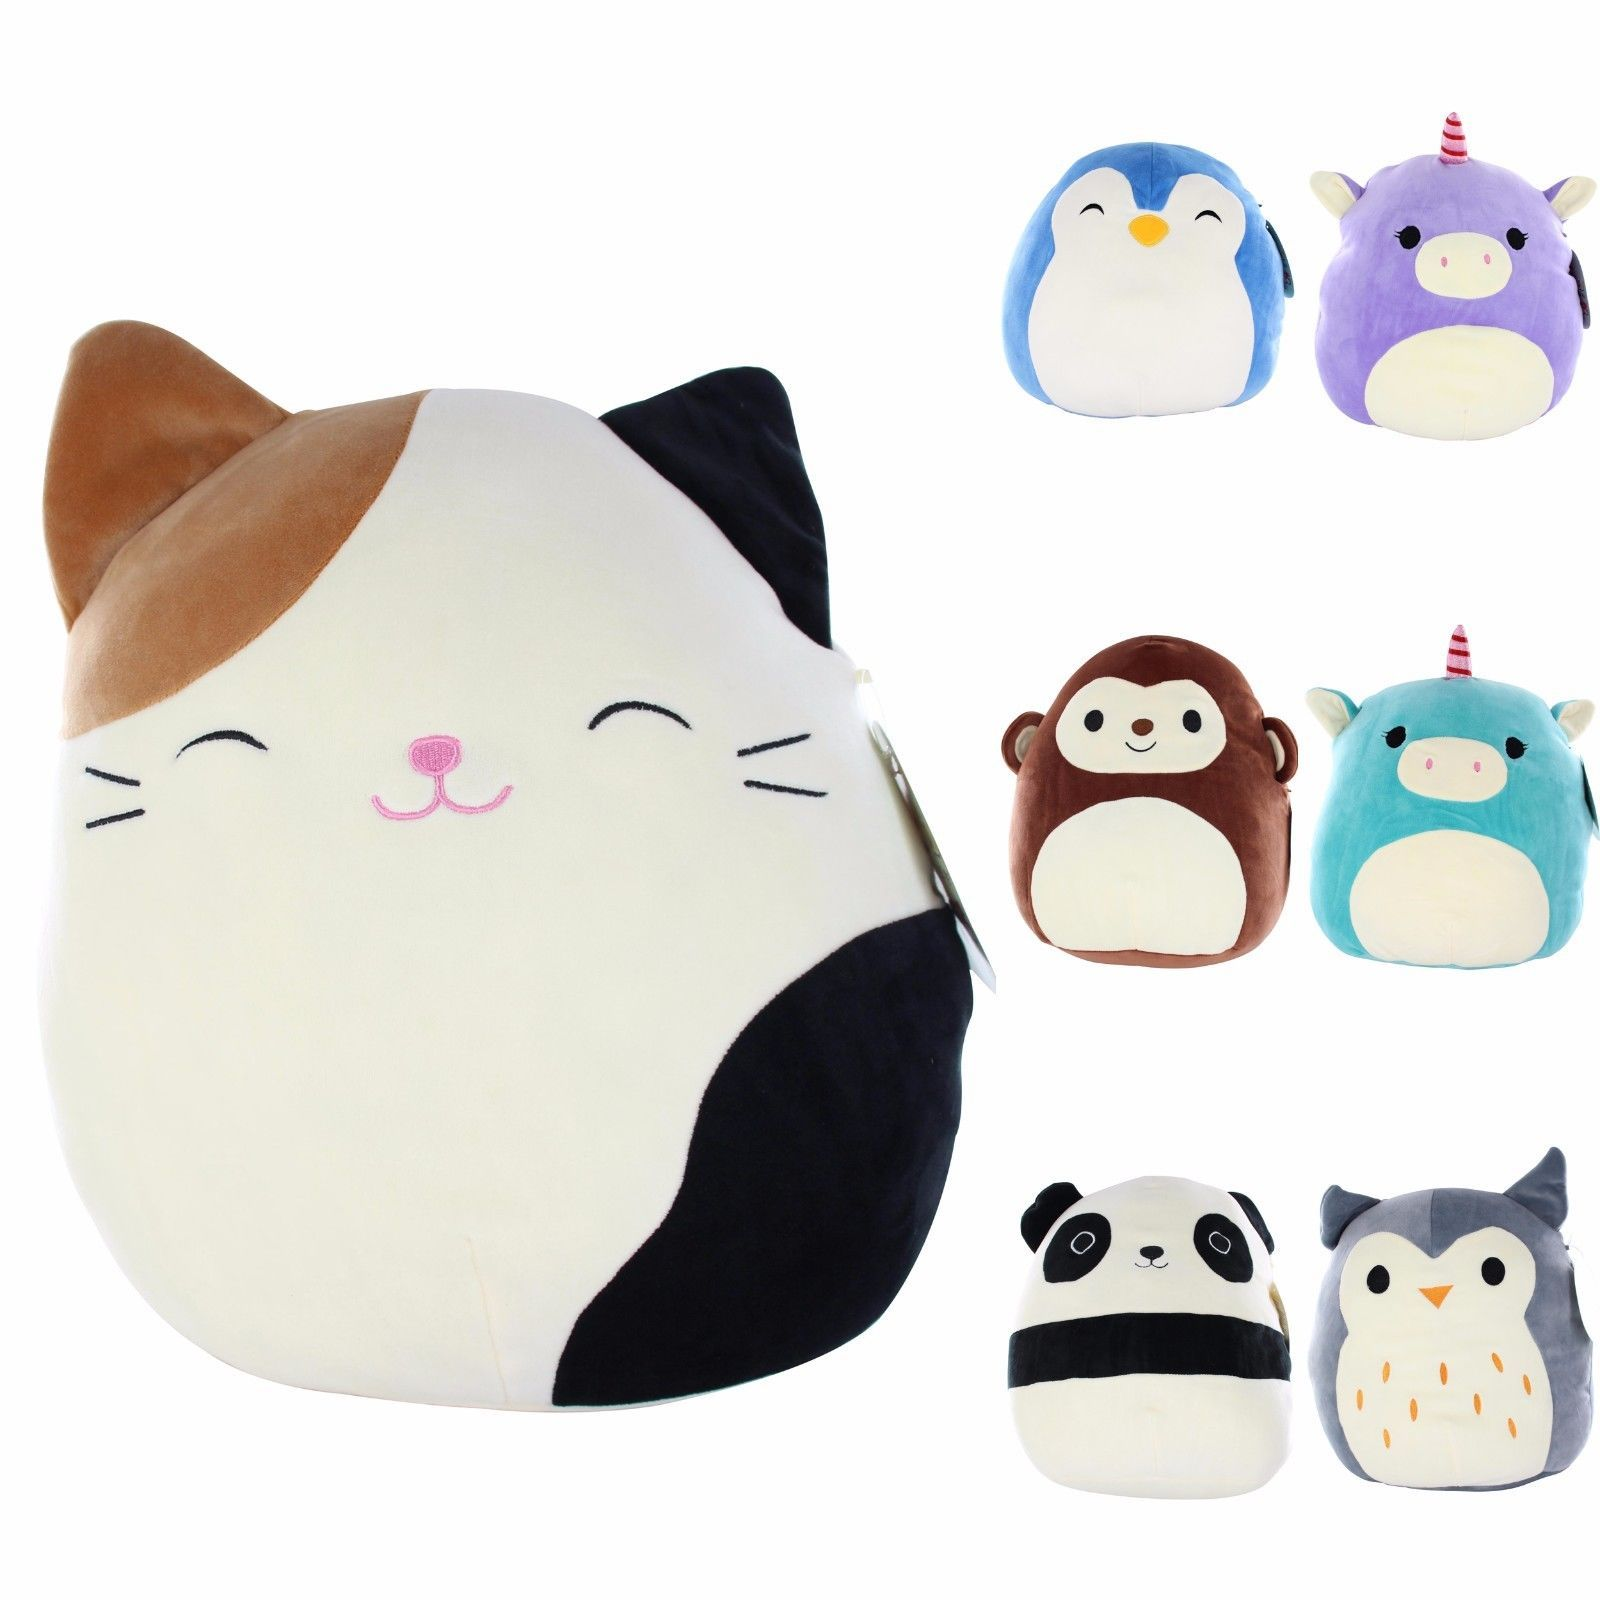 Squishy Mallow Animal Cute Super Soft Face Stress Less Throw Pillow Great Gift Ebay Home Garden Animal Pillows Pillow Pals Pet Toys